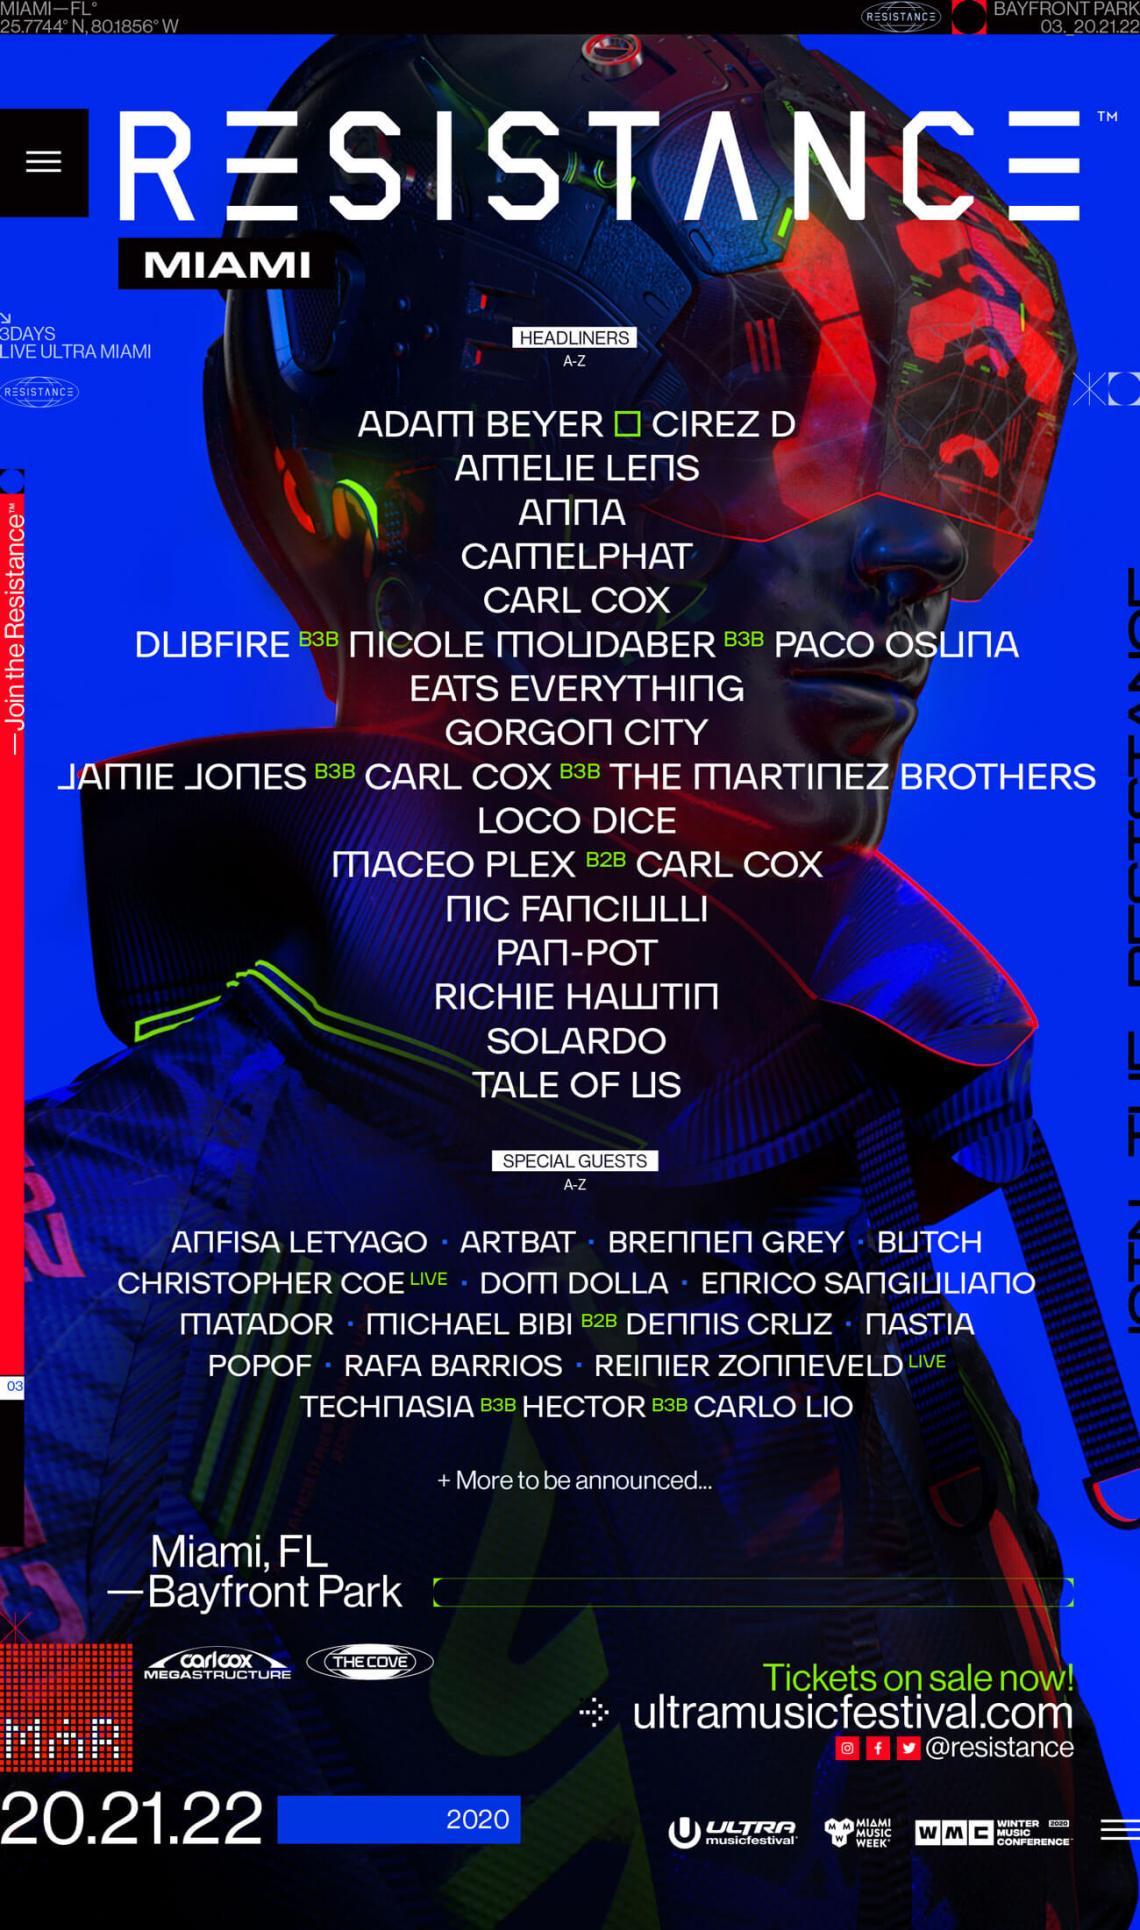 UMF ULTRA MUSIC FESTIVAL 2020 LINE UP